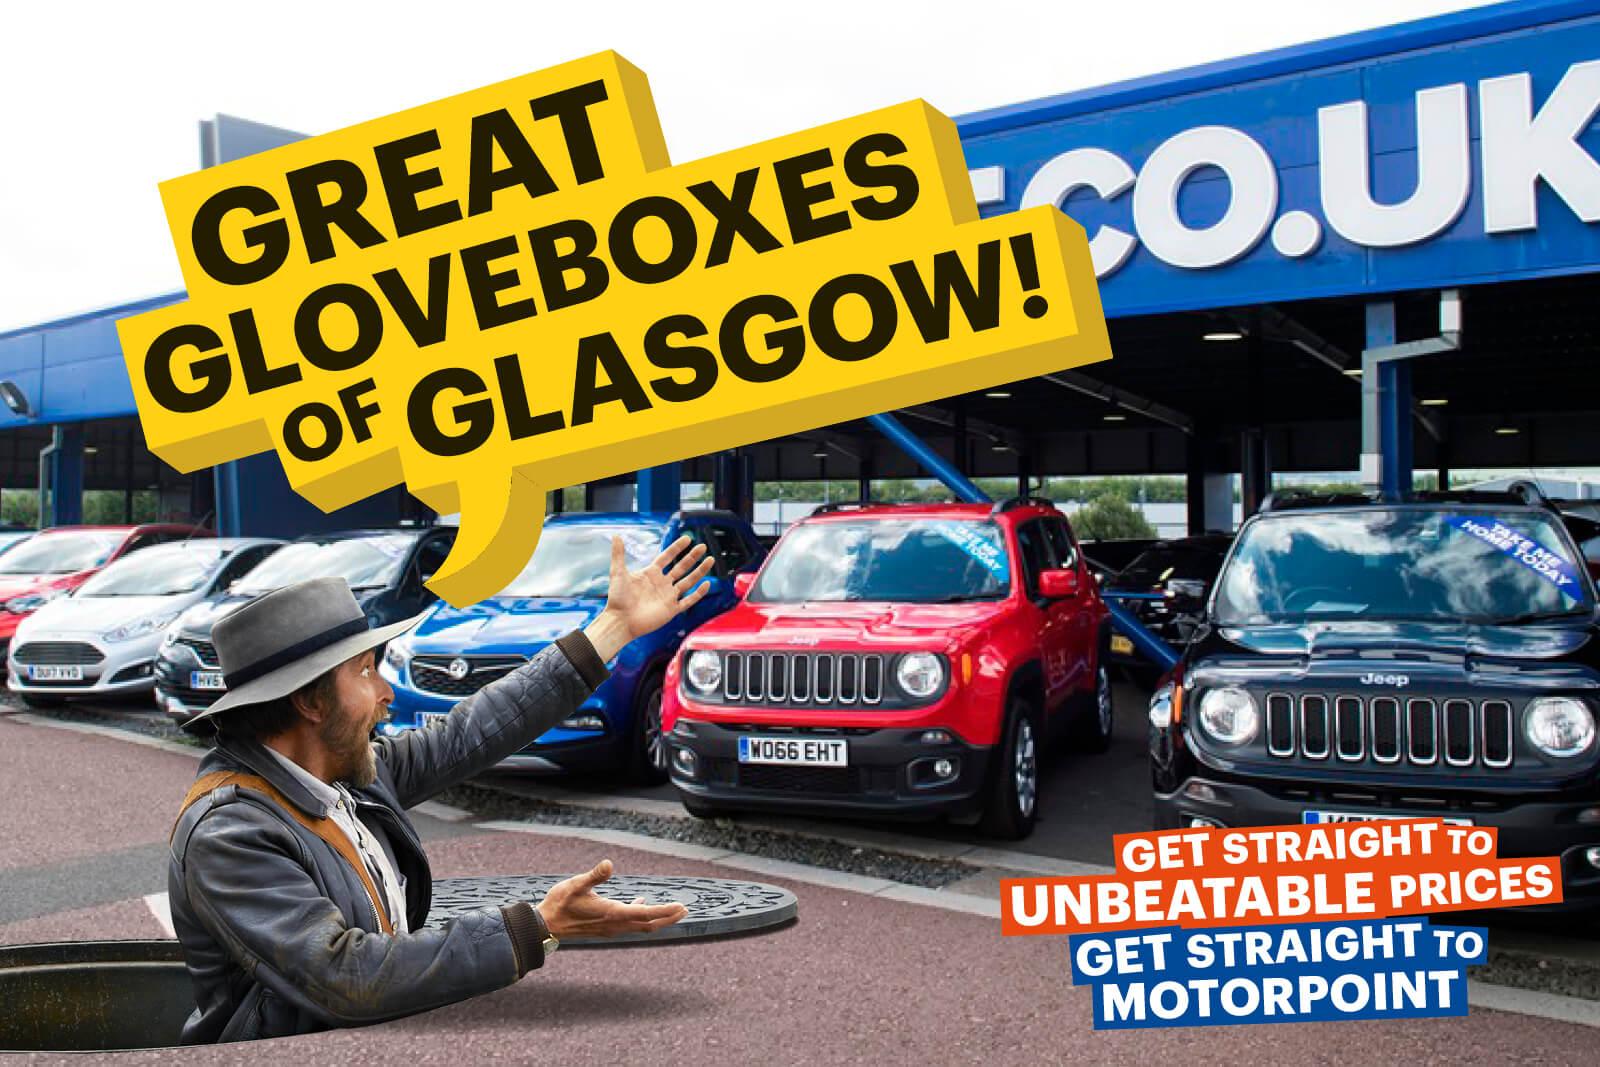 Glasgow showroom